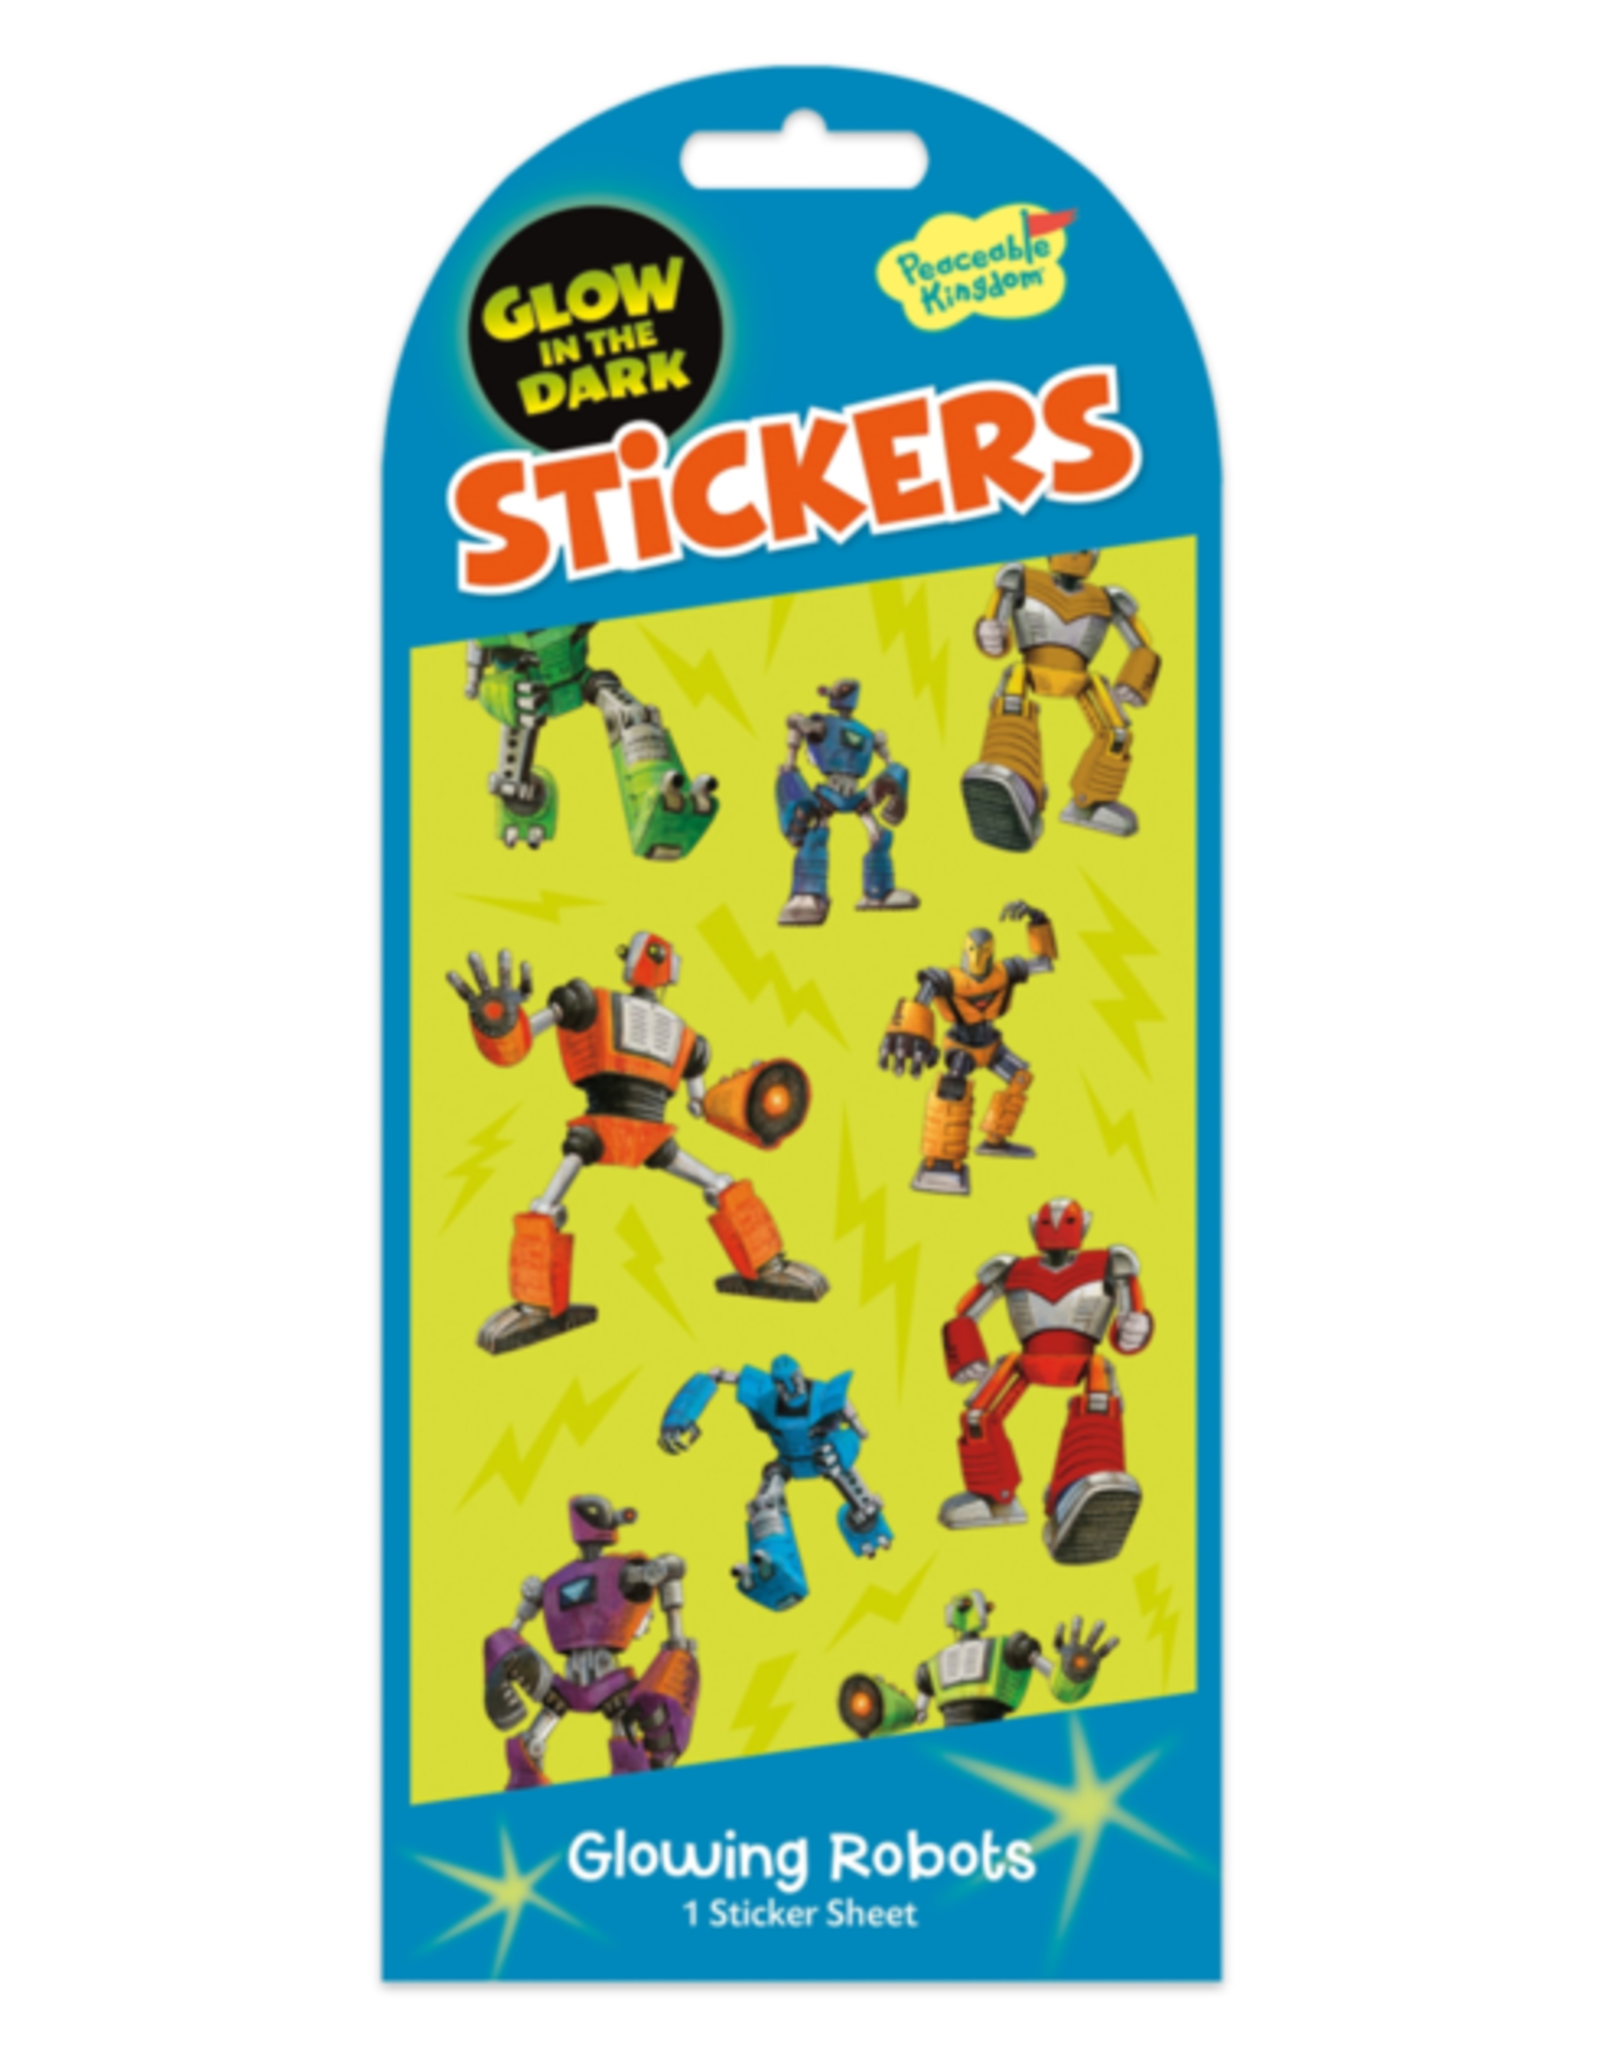 Peaceable Kingdom Glowing Robots Glow in the Dark Stickers